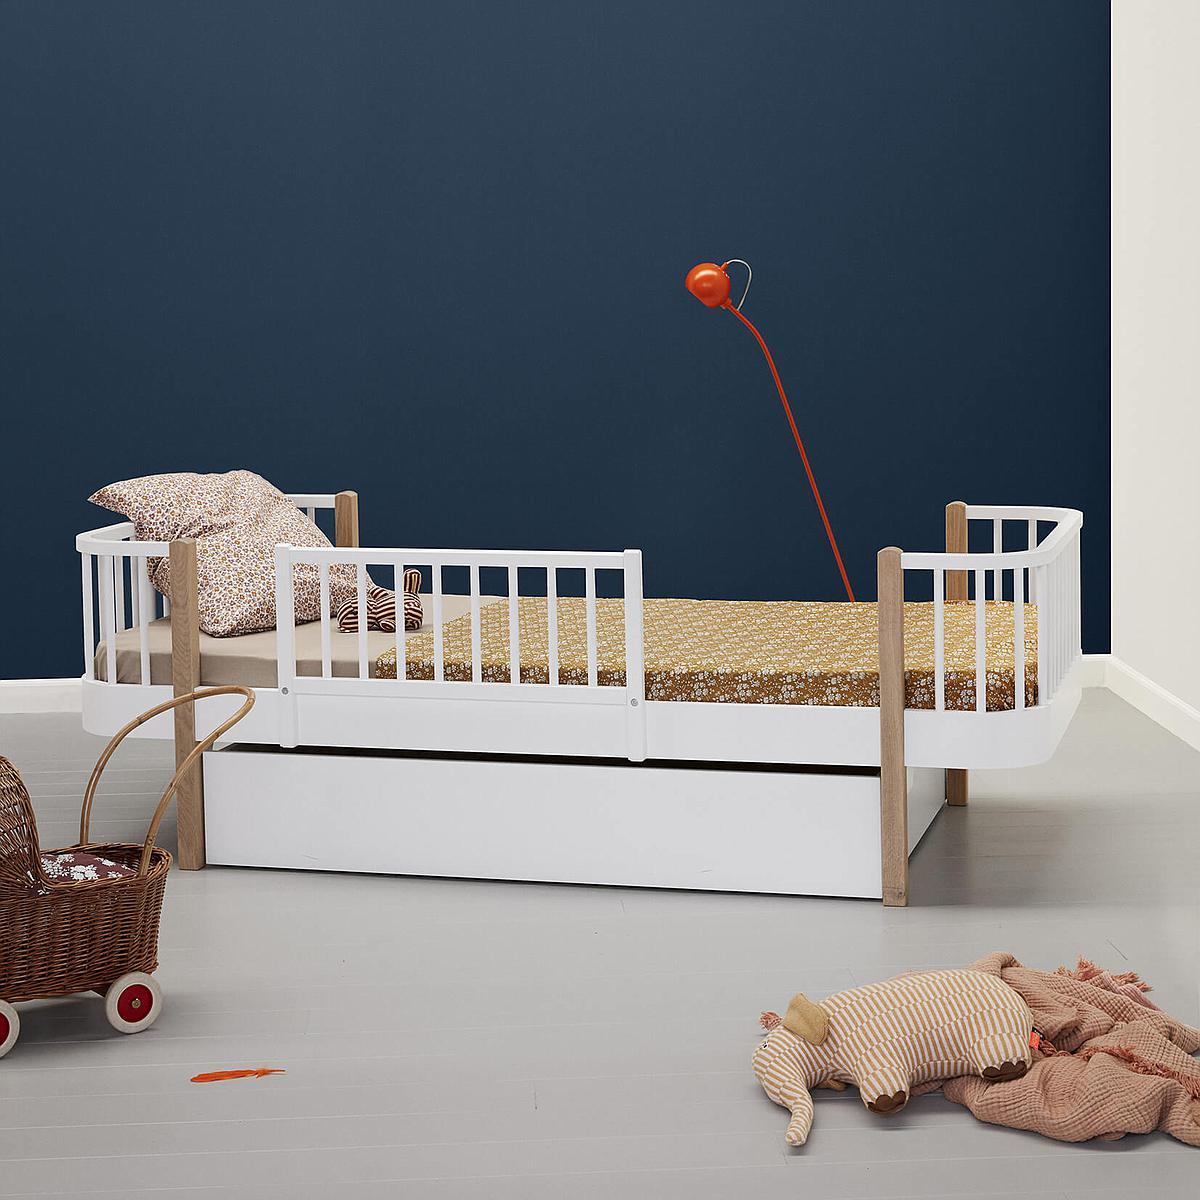 Lit bas évolutif 90x200cm WOOD ORIGINAL Oliver Furniture blanc